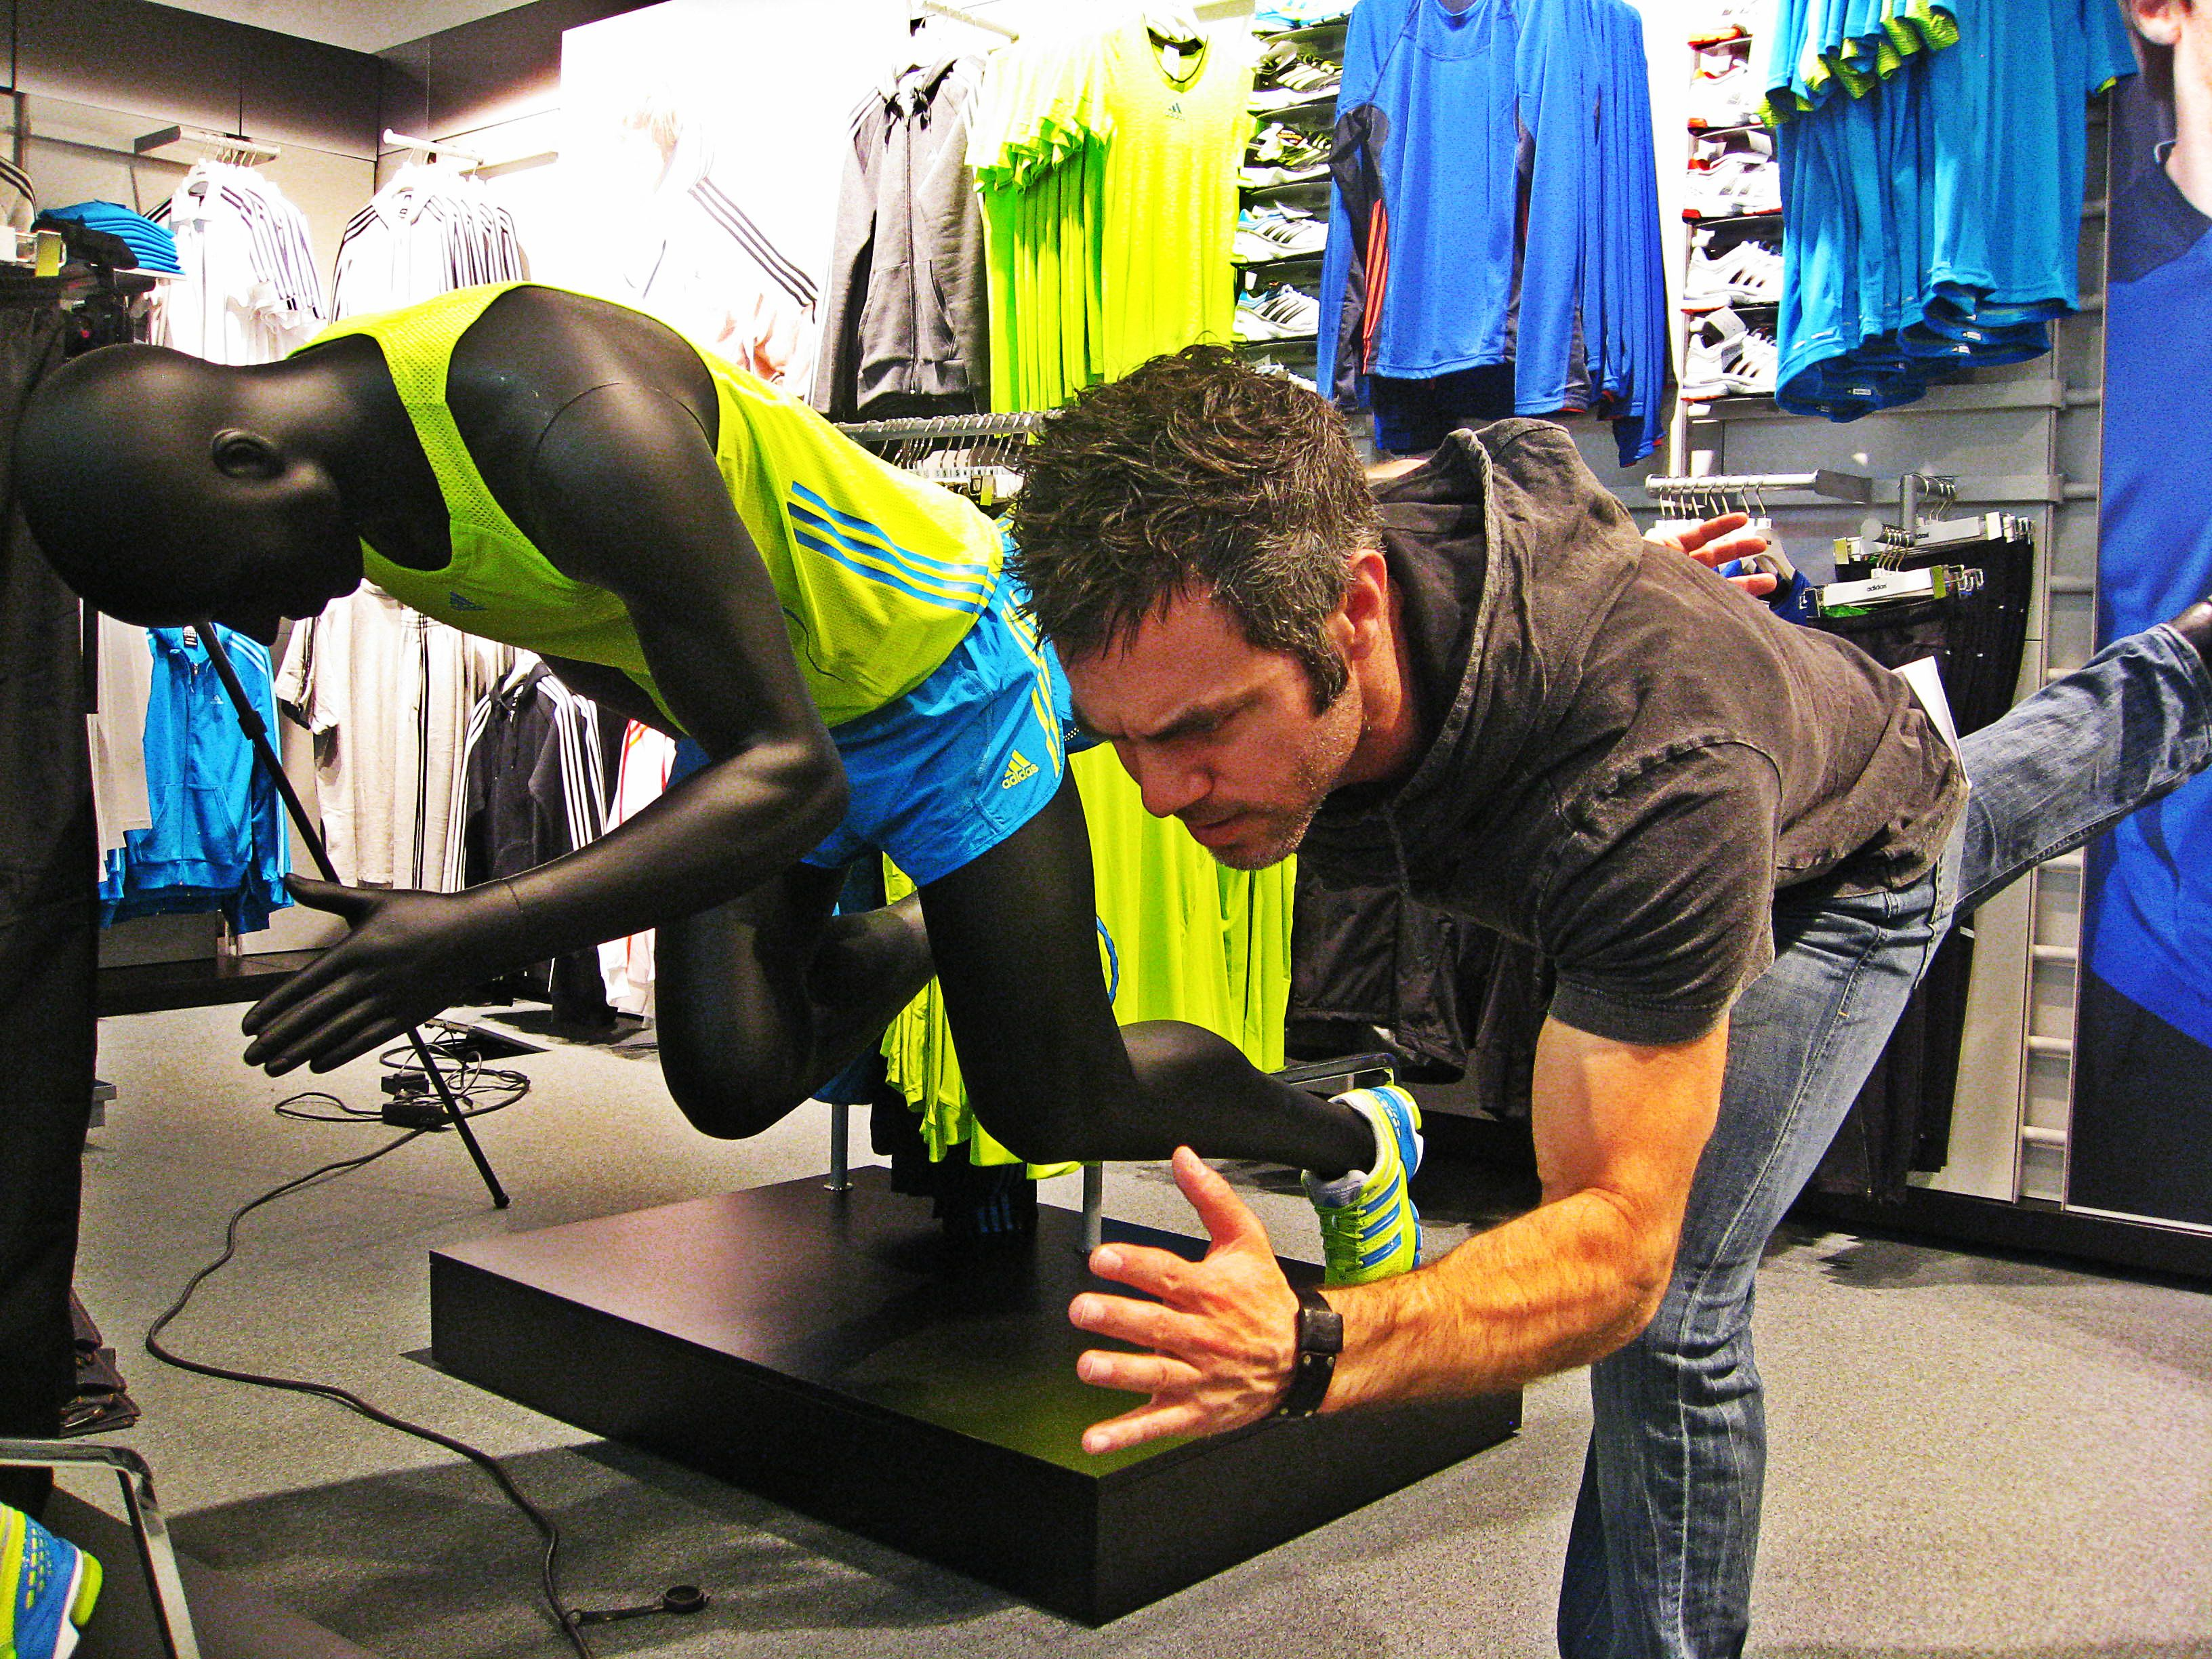 trolebús pagar Mezclado  Run - adidas Group Careers   Running, Career, Career sites